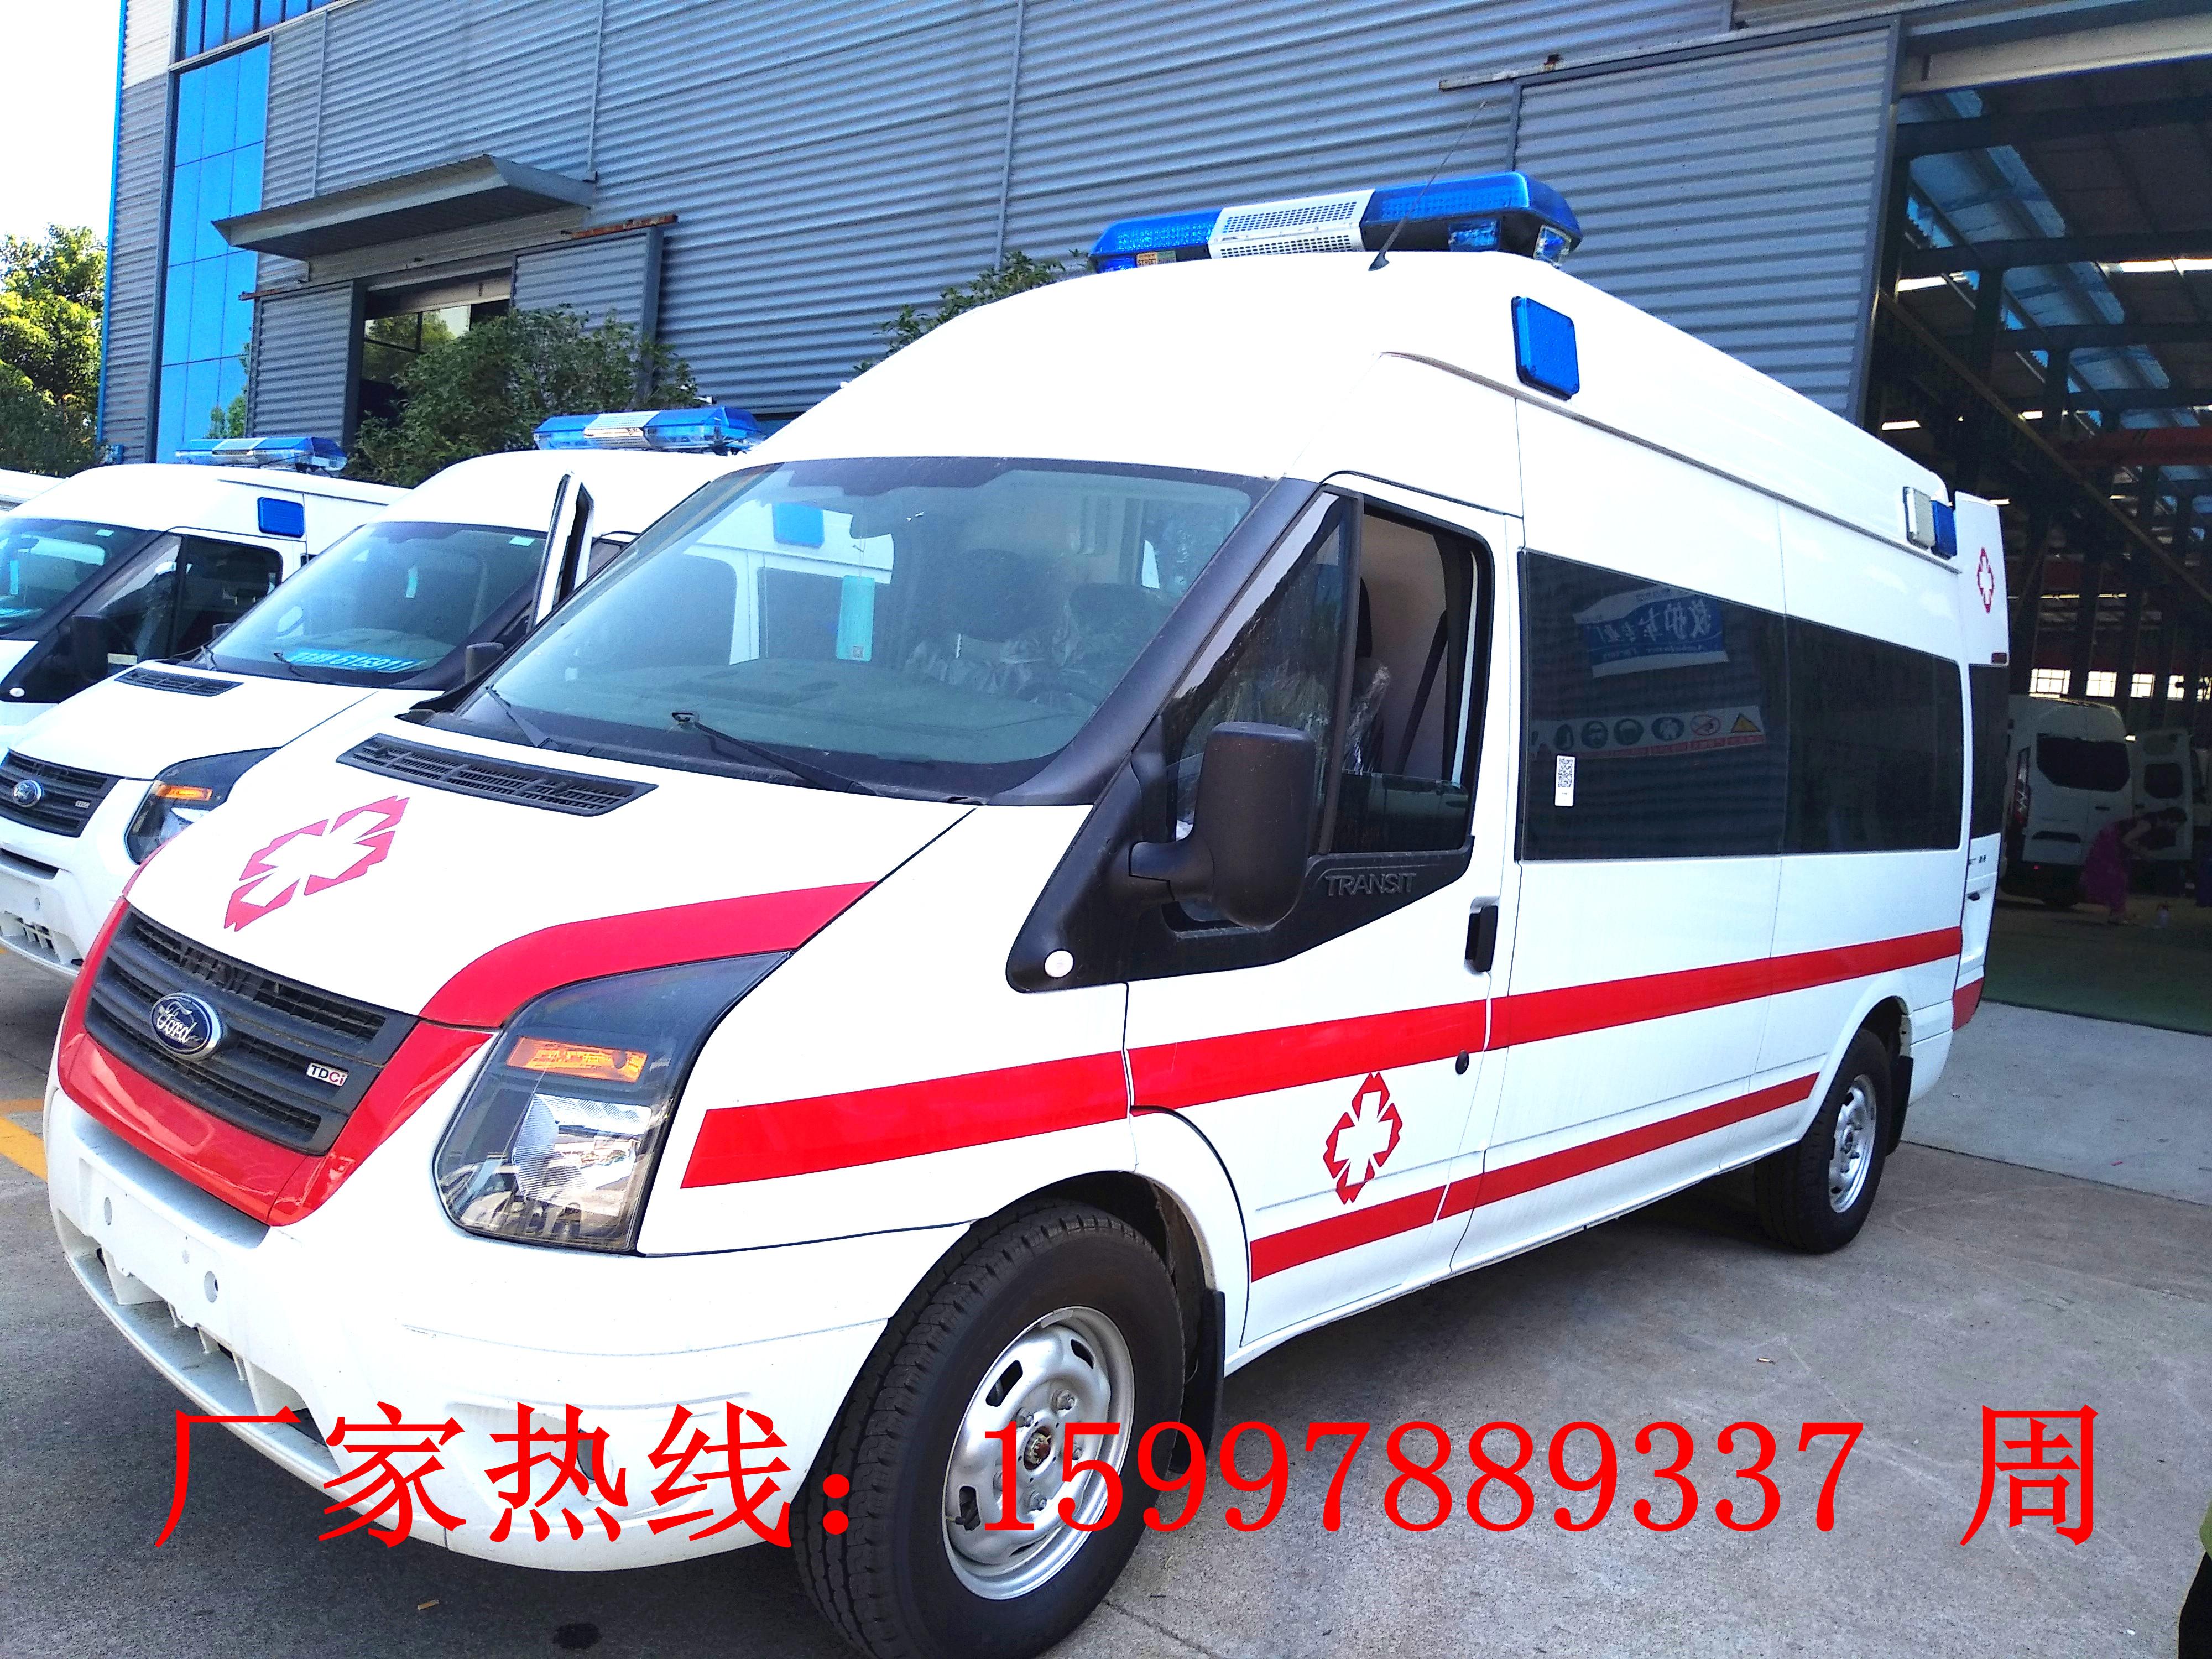 V348长轴高顶救护车厂家